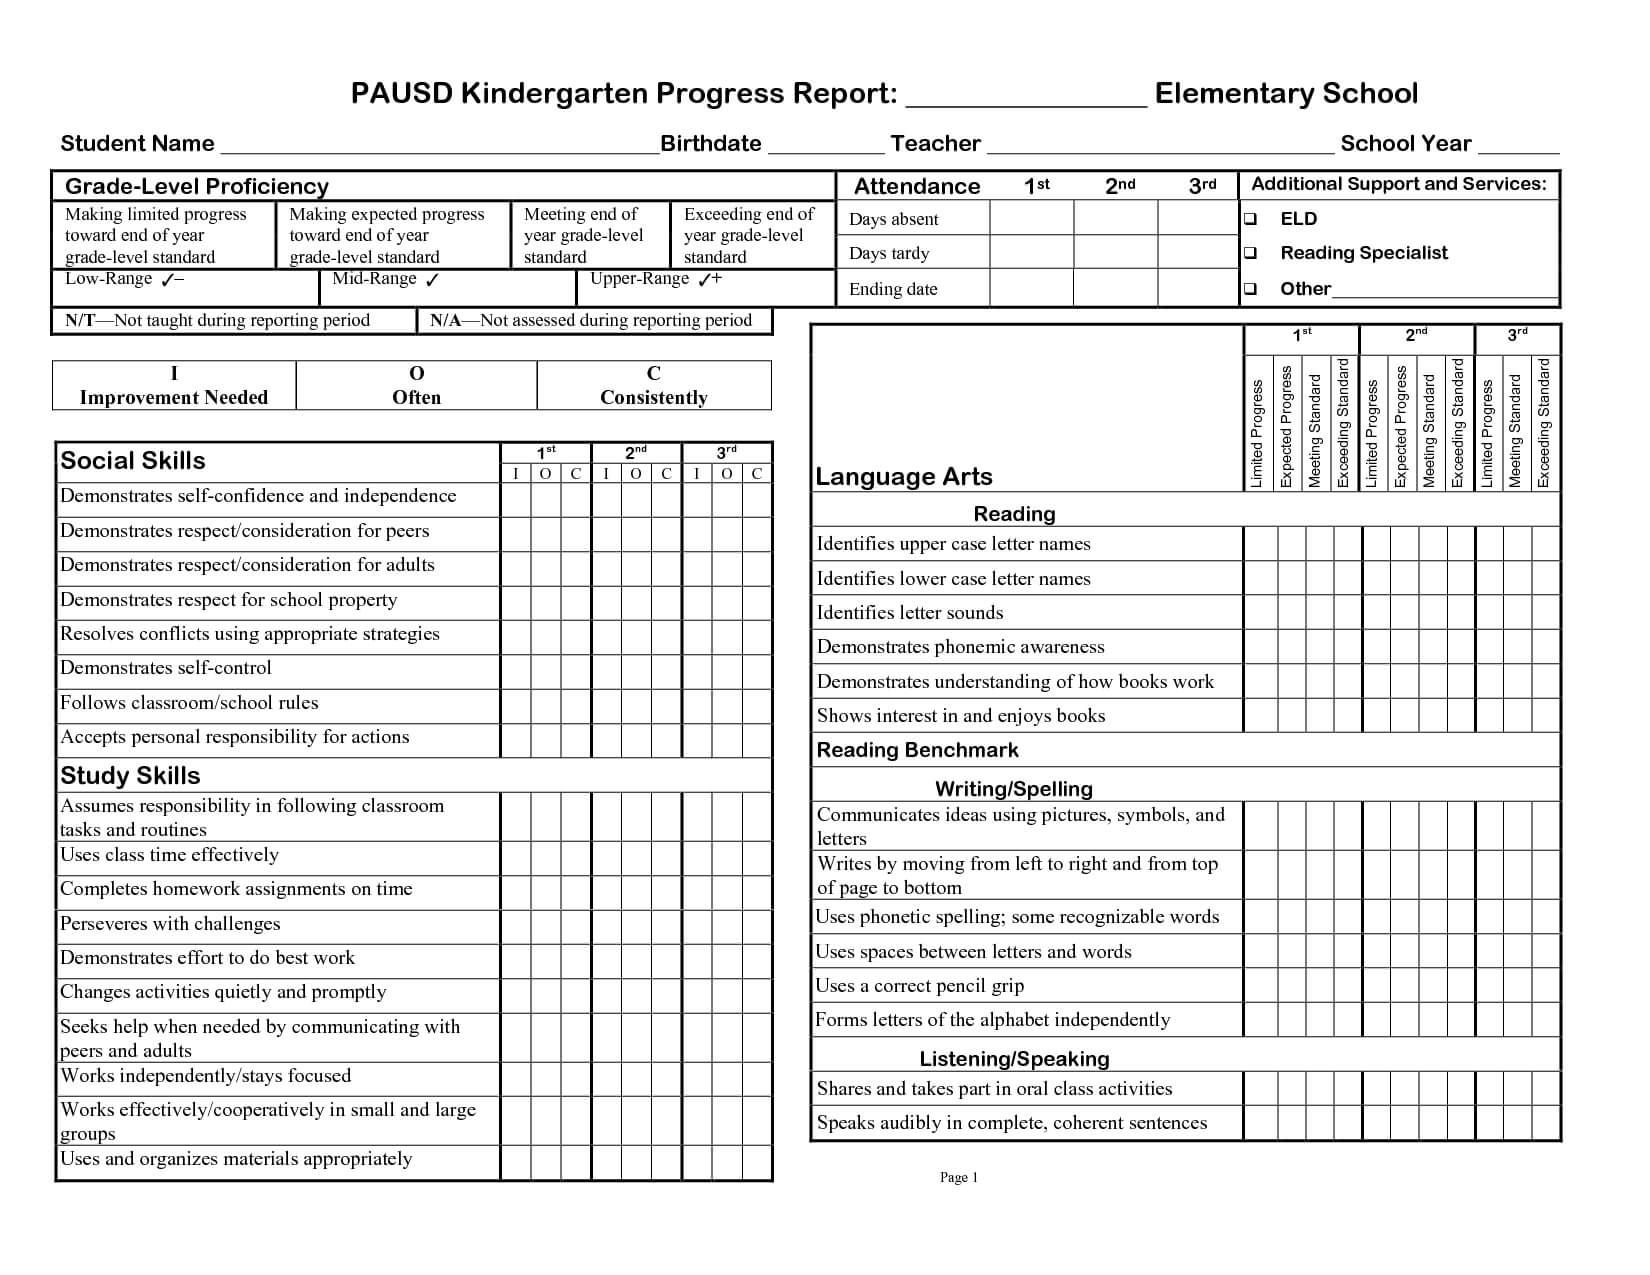 Kindergarten Social Skills Progress Report Blank Templates With Regard To High School Progress Report Template